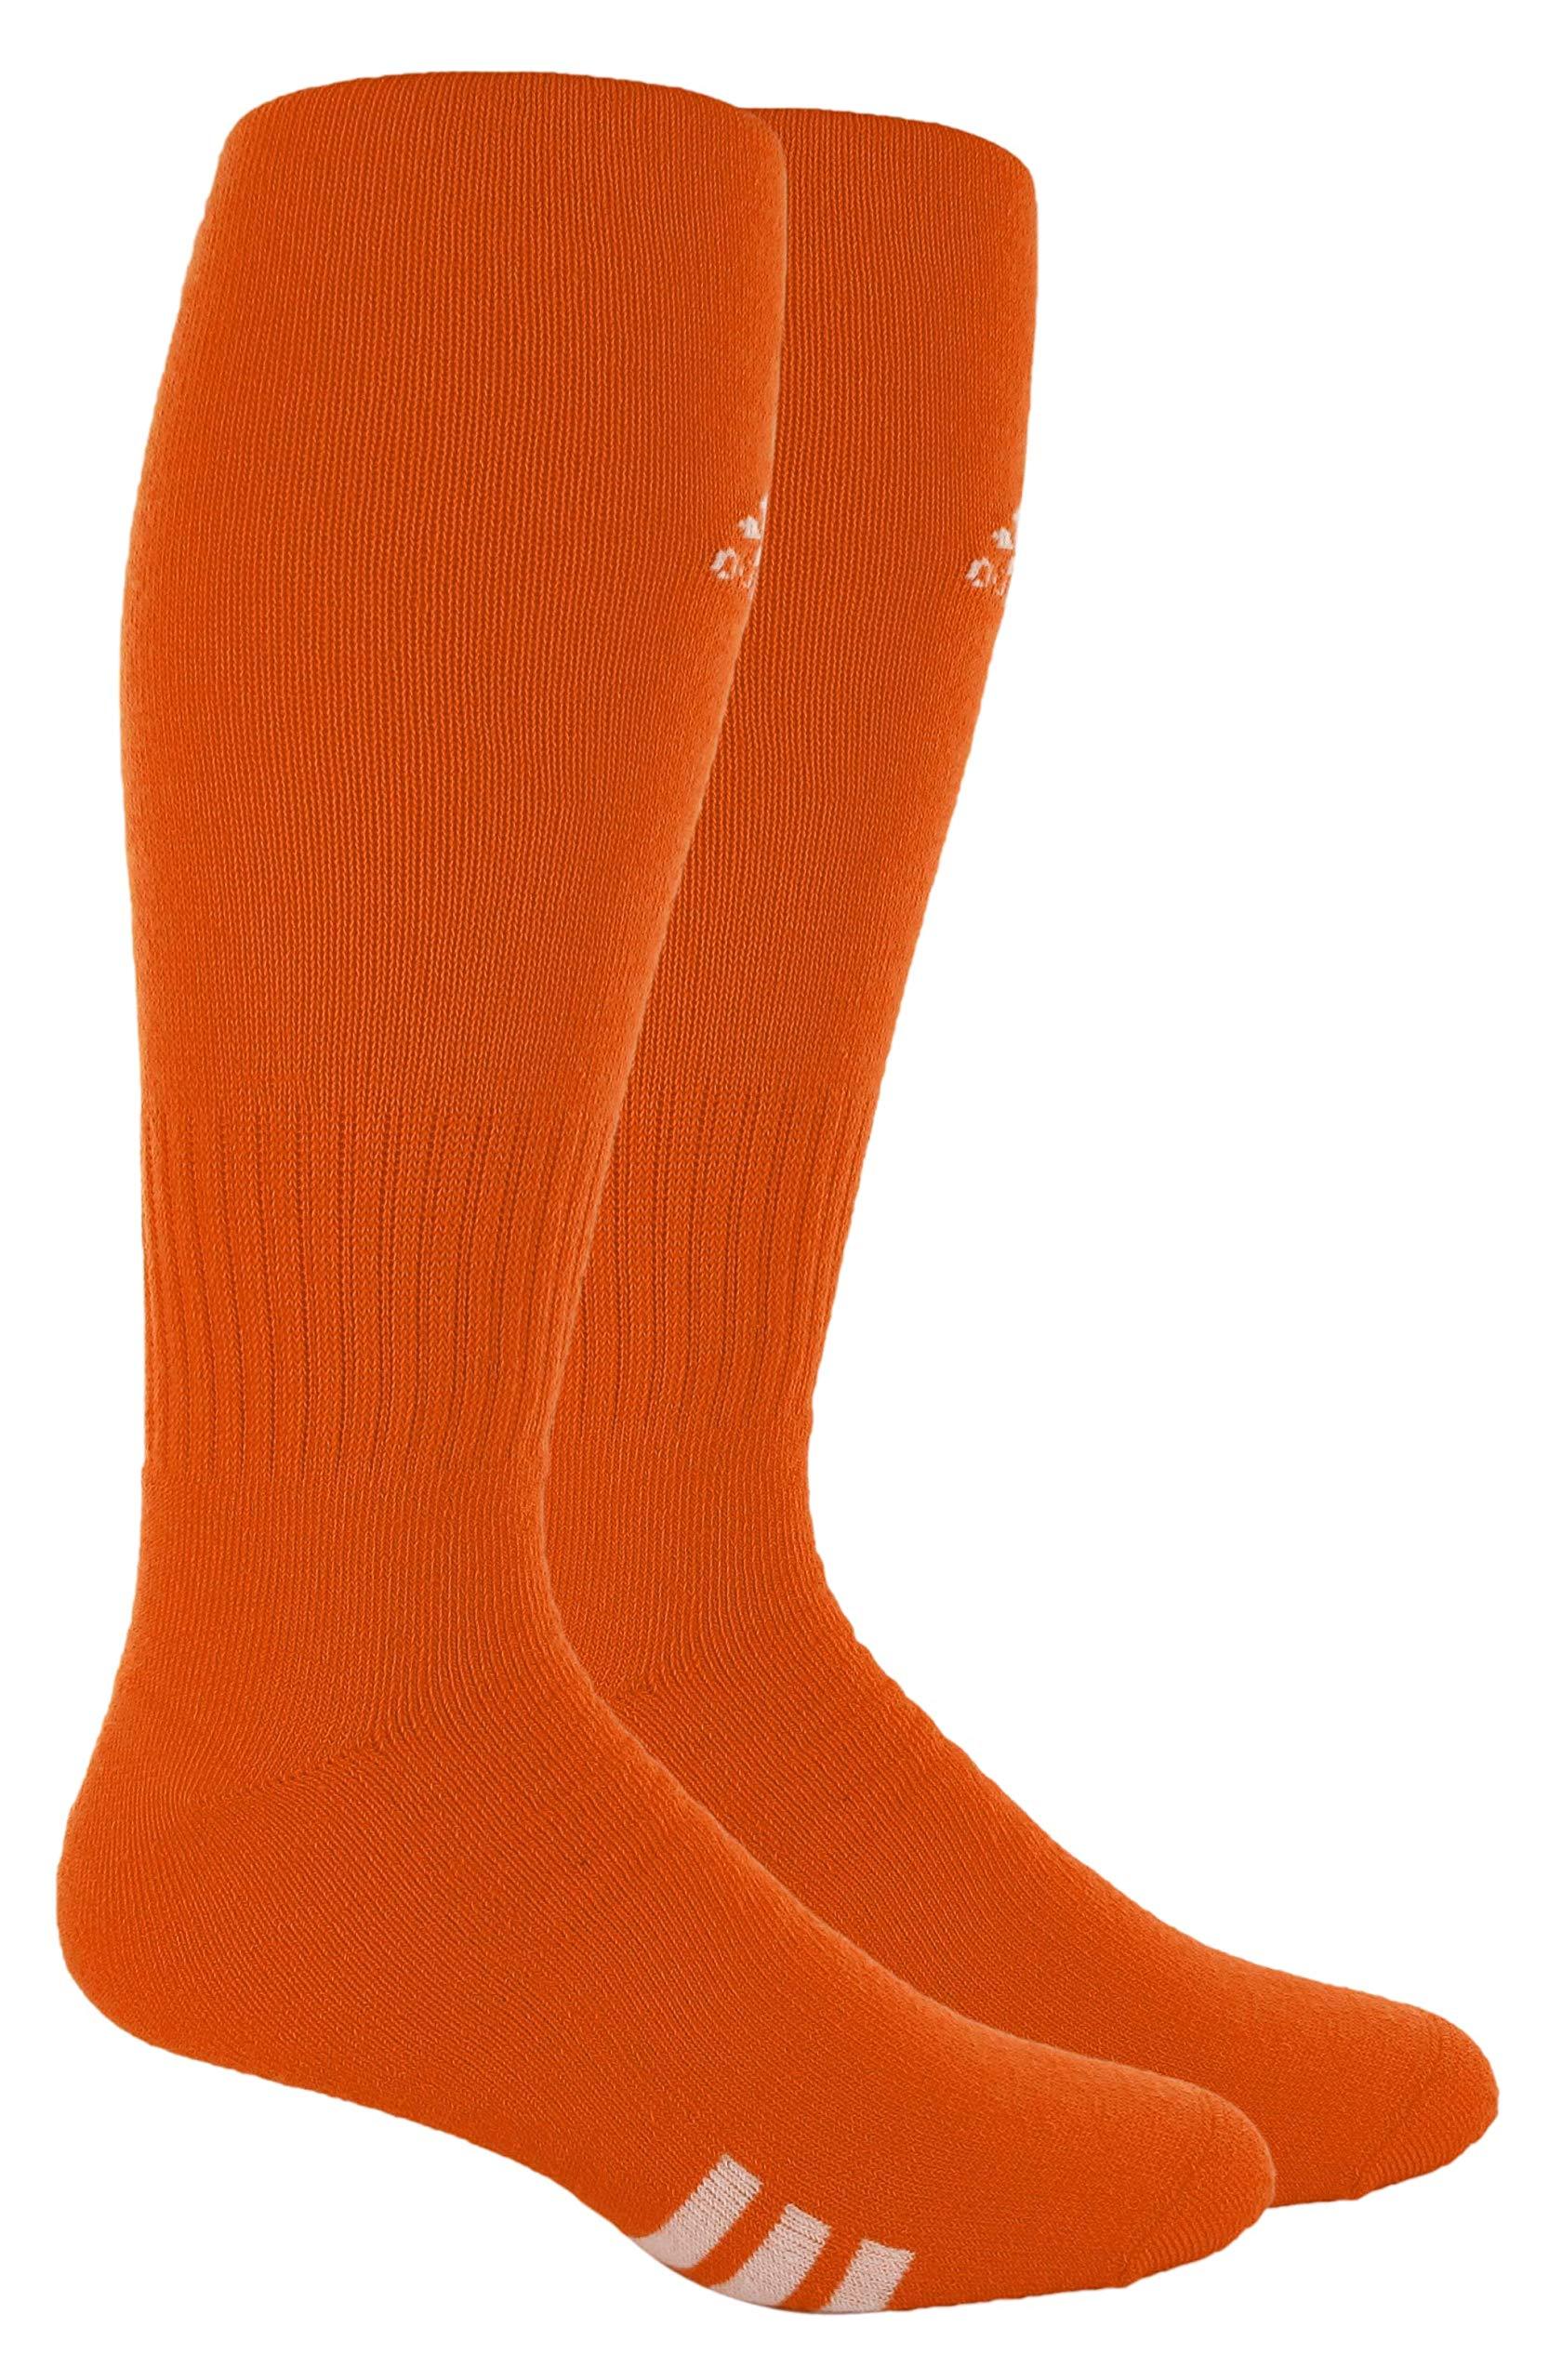 adidas Unisex Rivalry Field OTC Sock (2-Pair), Team Orange/White, 5-8.5 by adidas